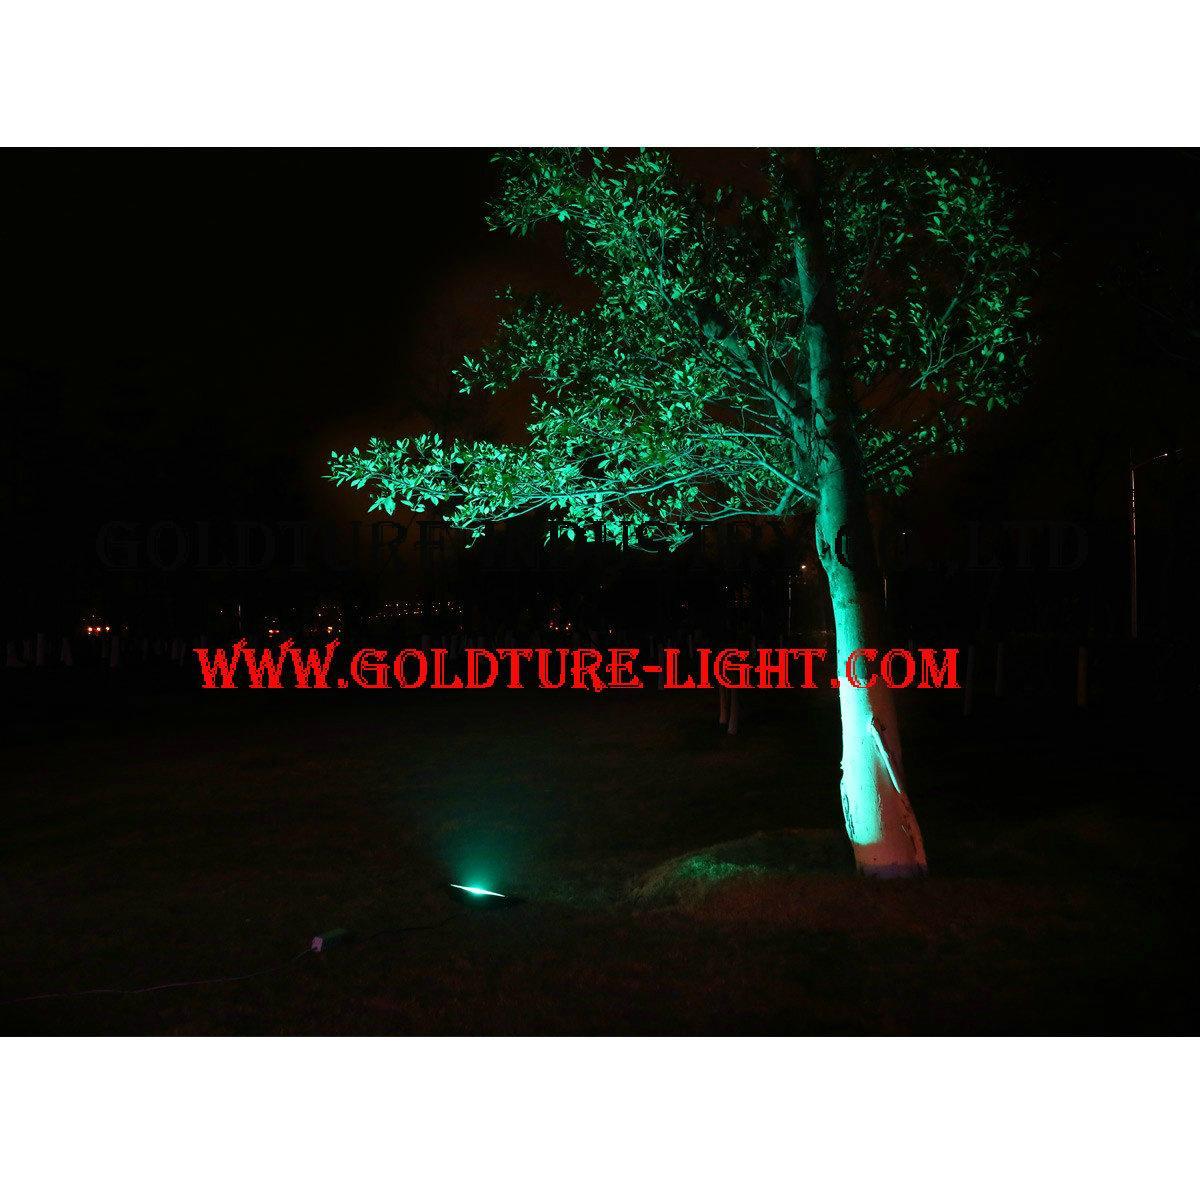 Spotlight Led Reflector 30W Lamps Floodlight With PIR Motion Sensor 4